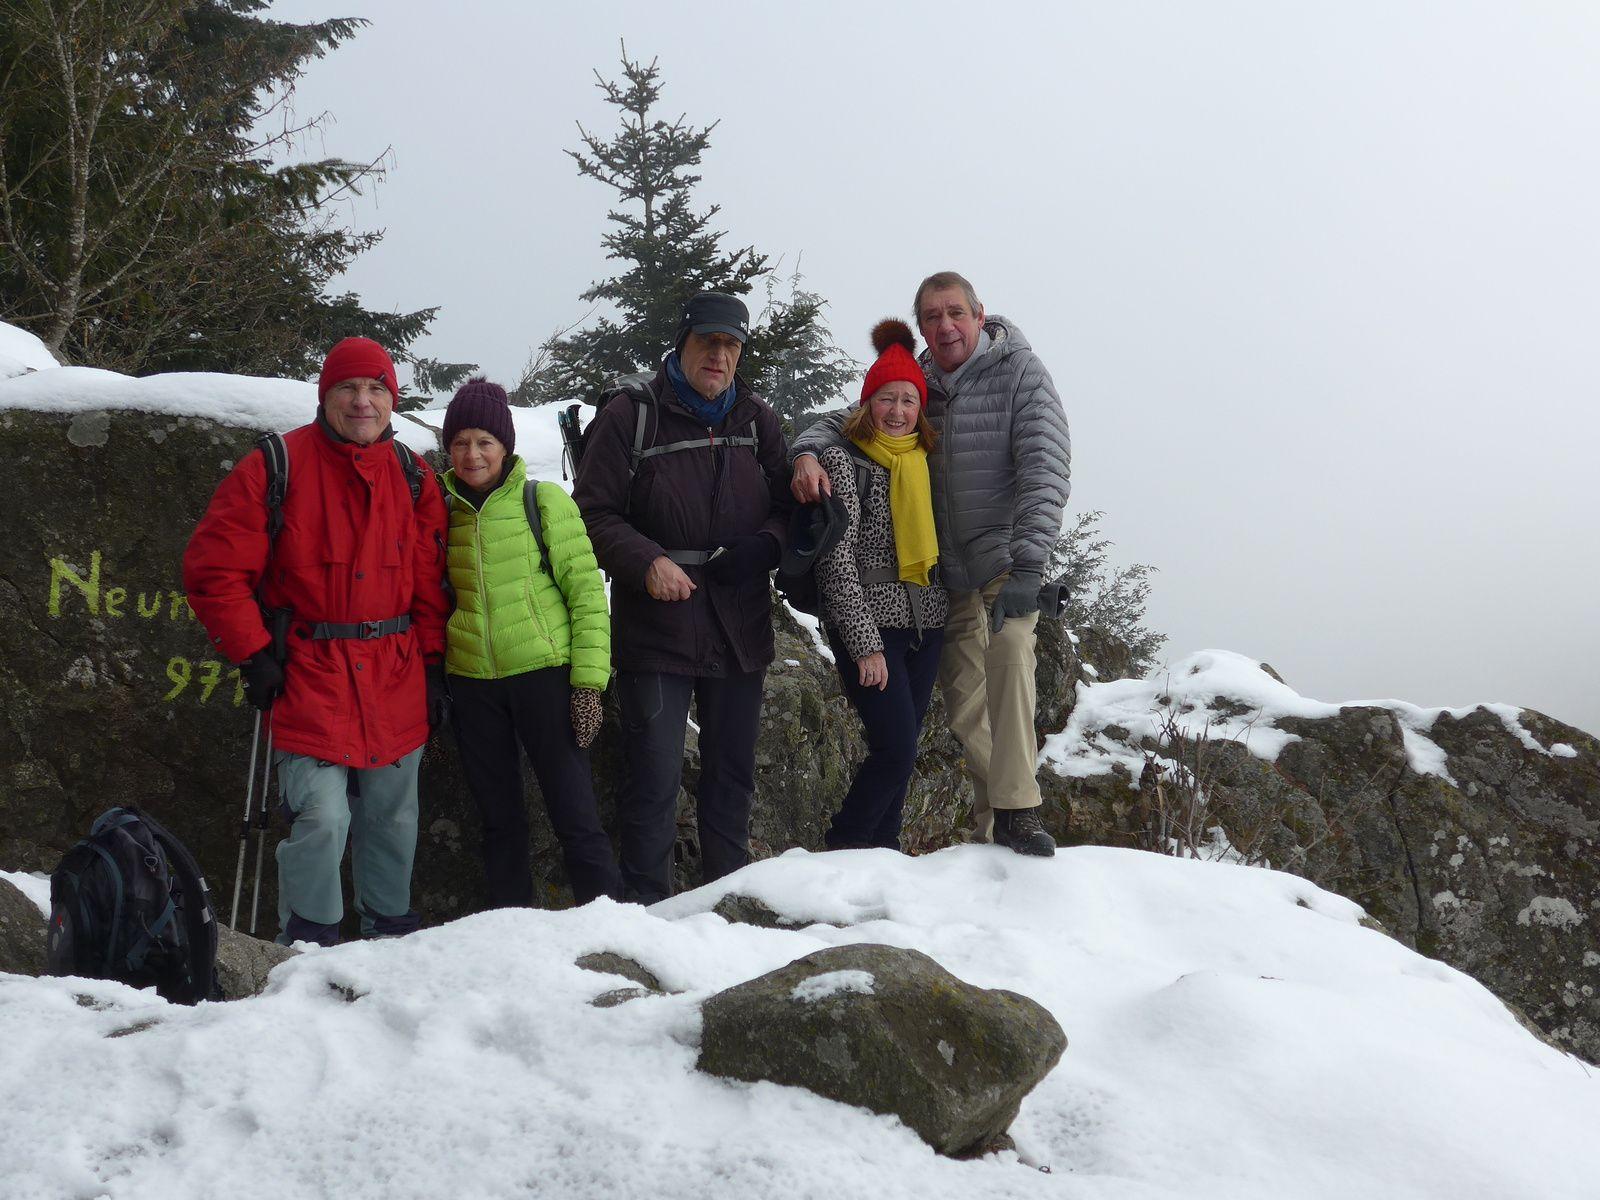 Au sommet du Neuntelstein à 971 mètres.